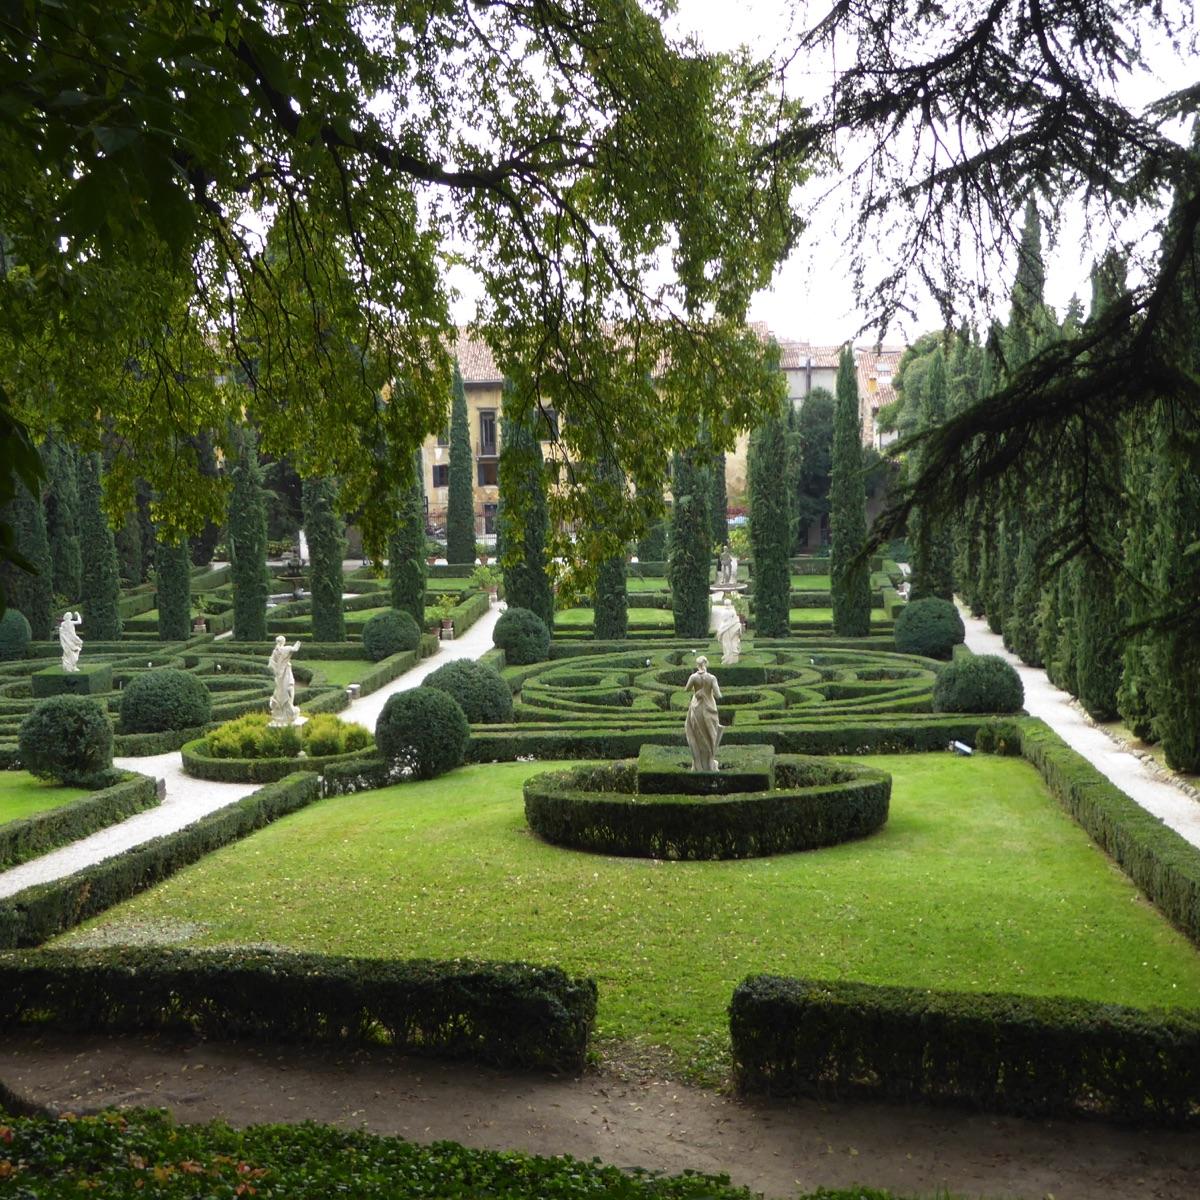 Amici in giardino giardinaggio e dintorni giardinaggio for Giardino e palazzo giusti